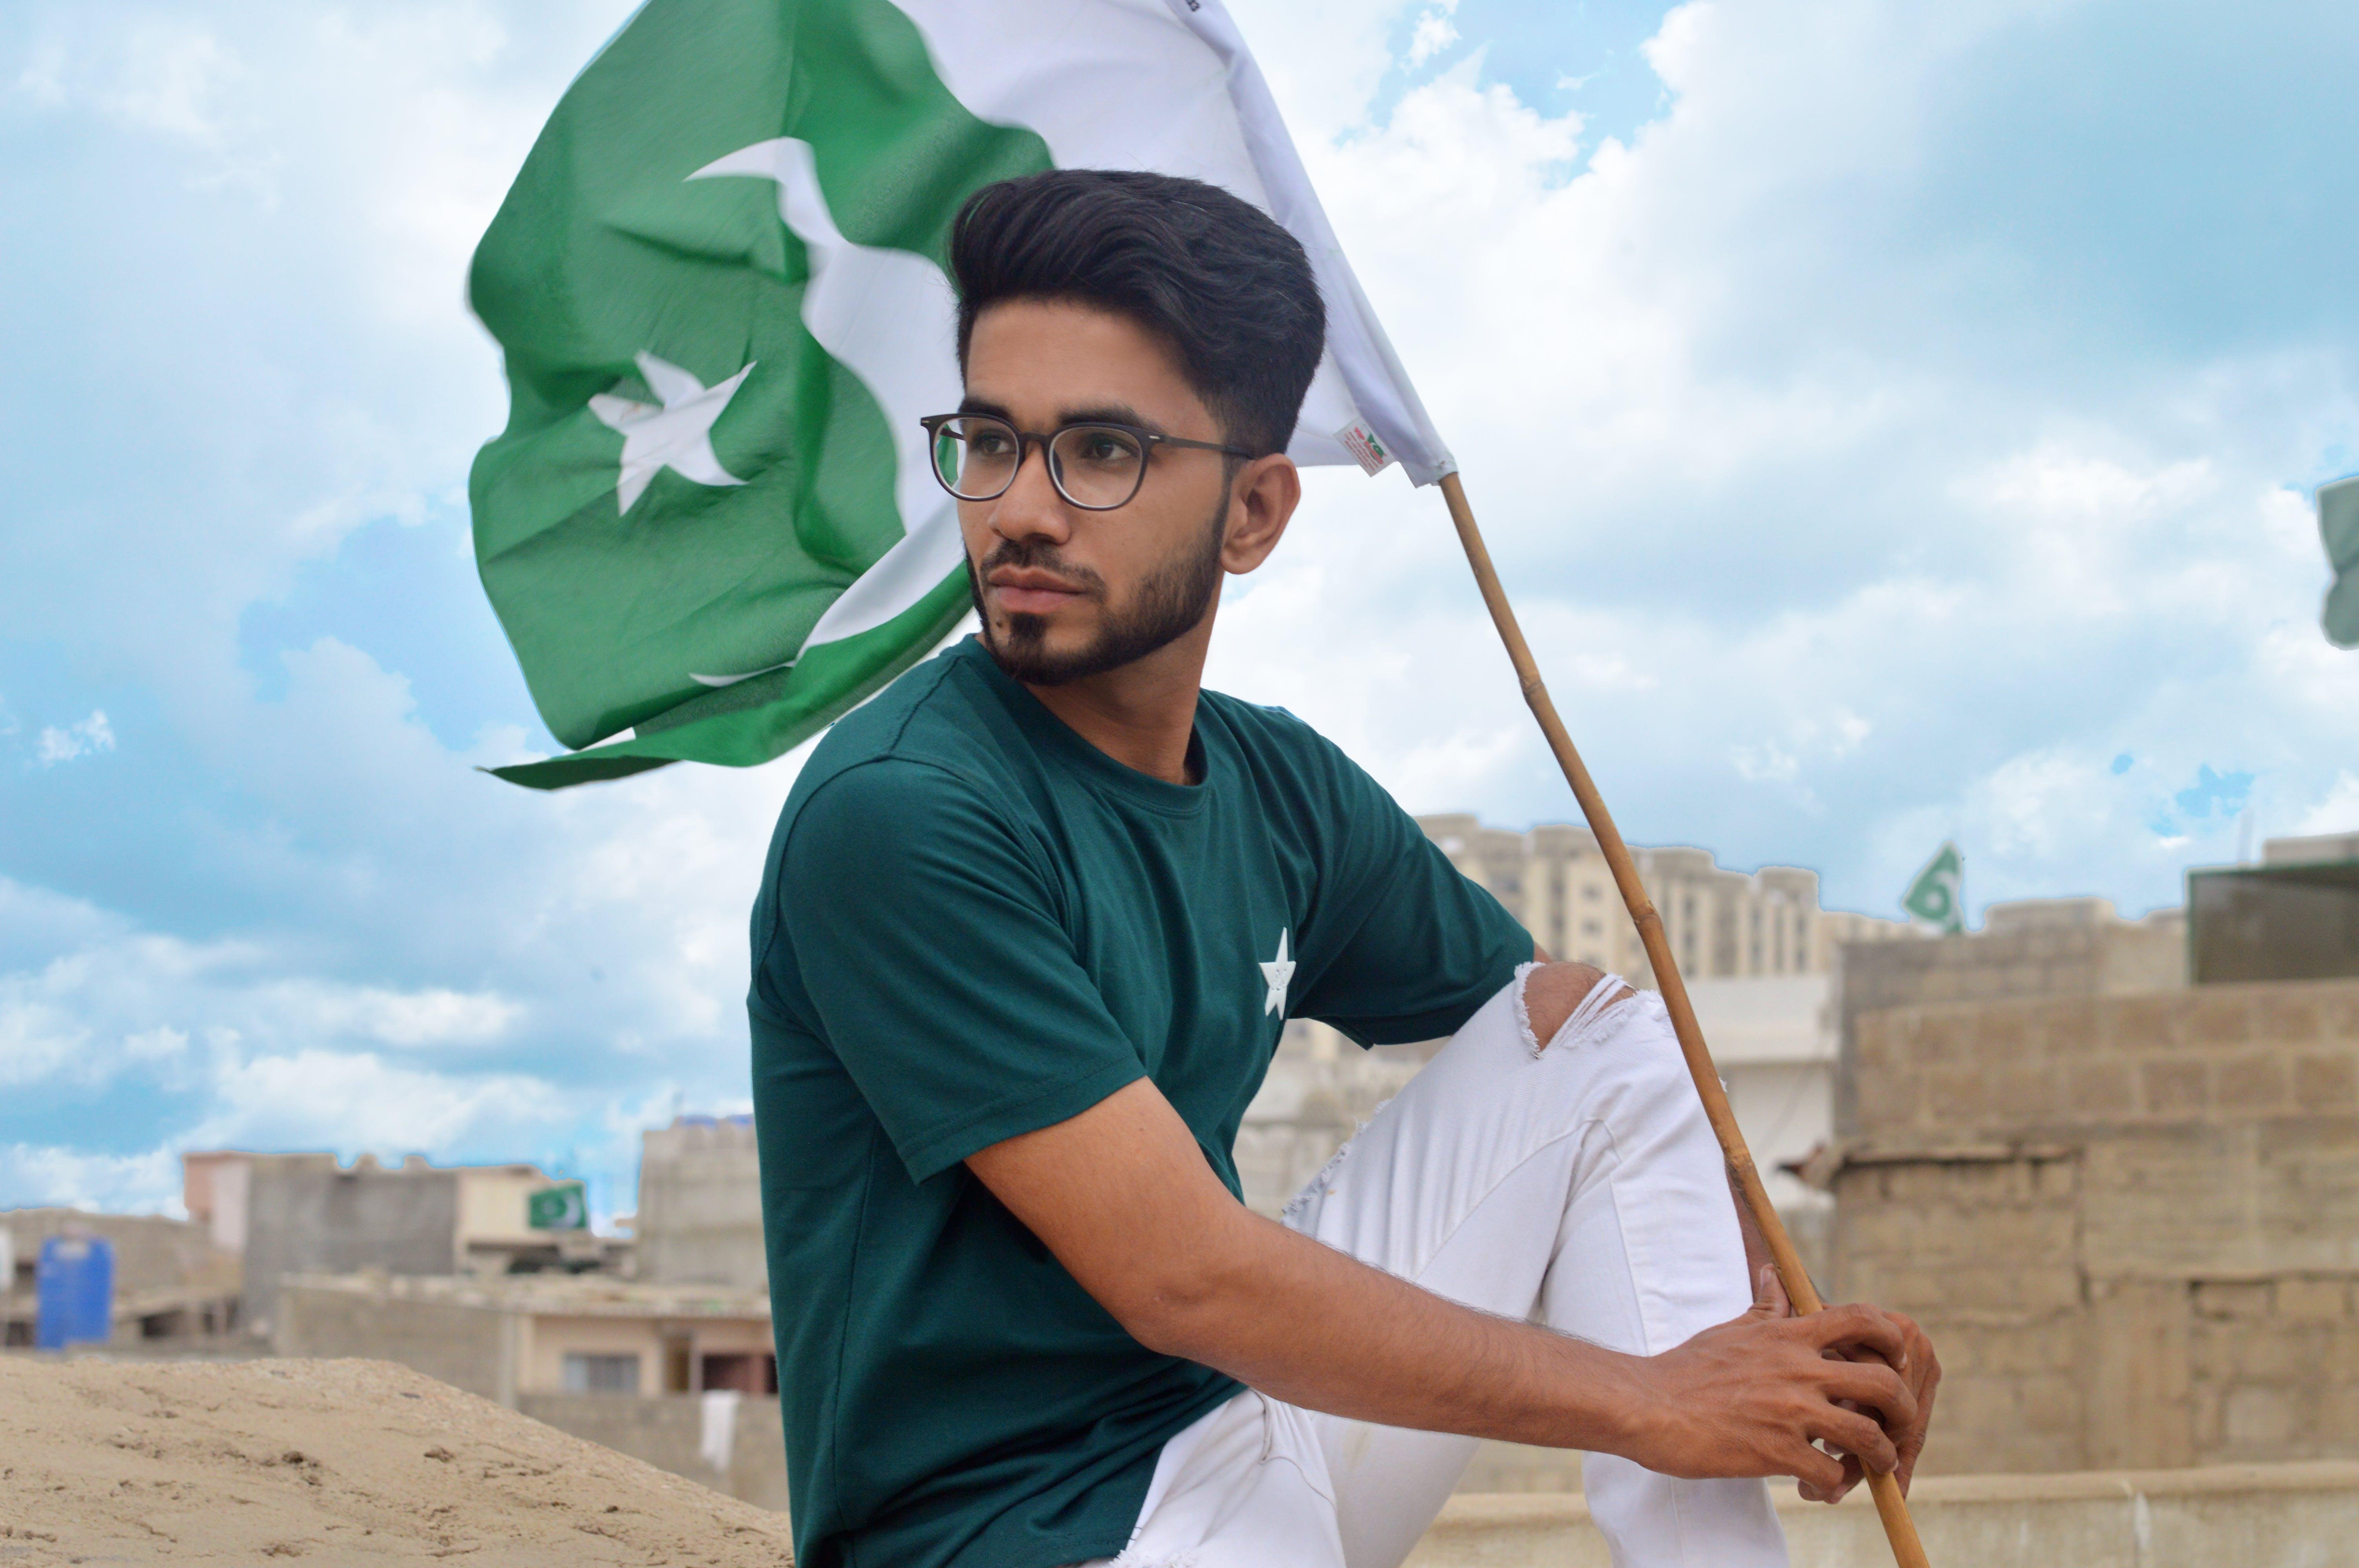 Free stock photo of 14_augest #azadi #freedom #pakistaniflag #pakistan, 4k wallpaper, android wallpaper, desktop background